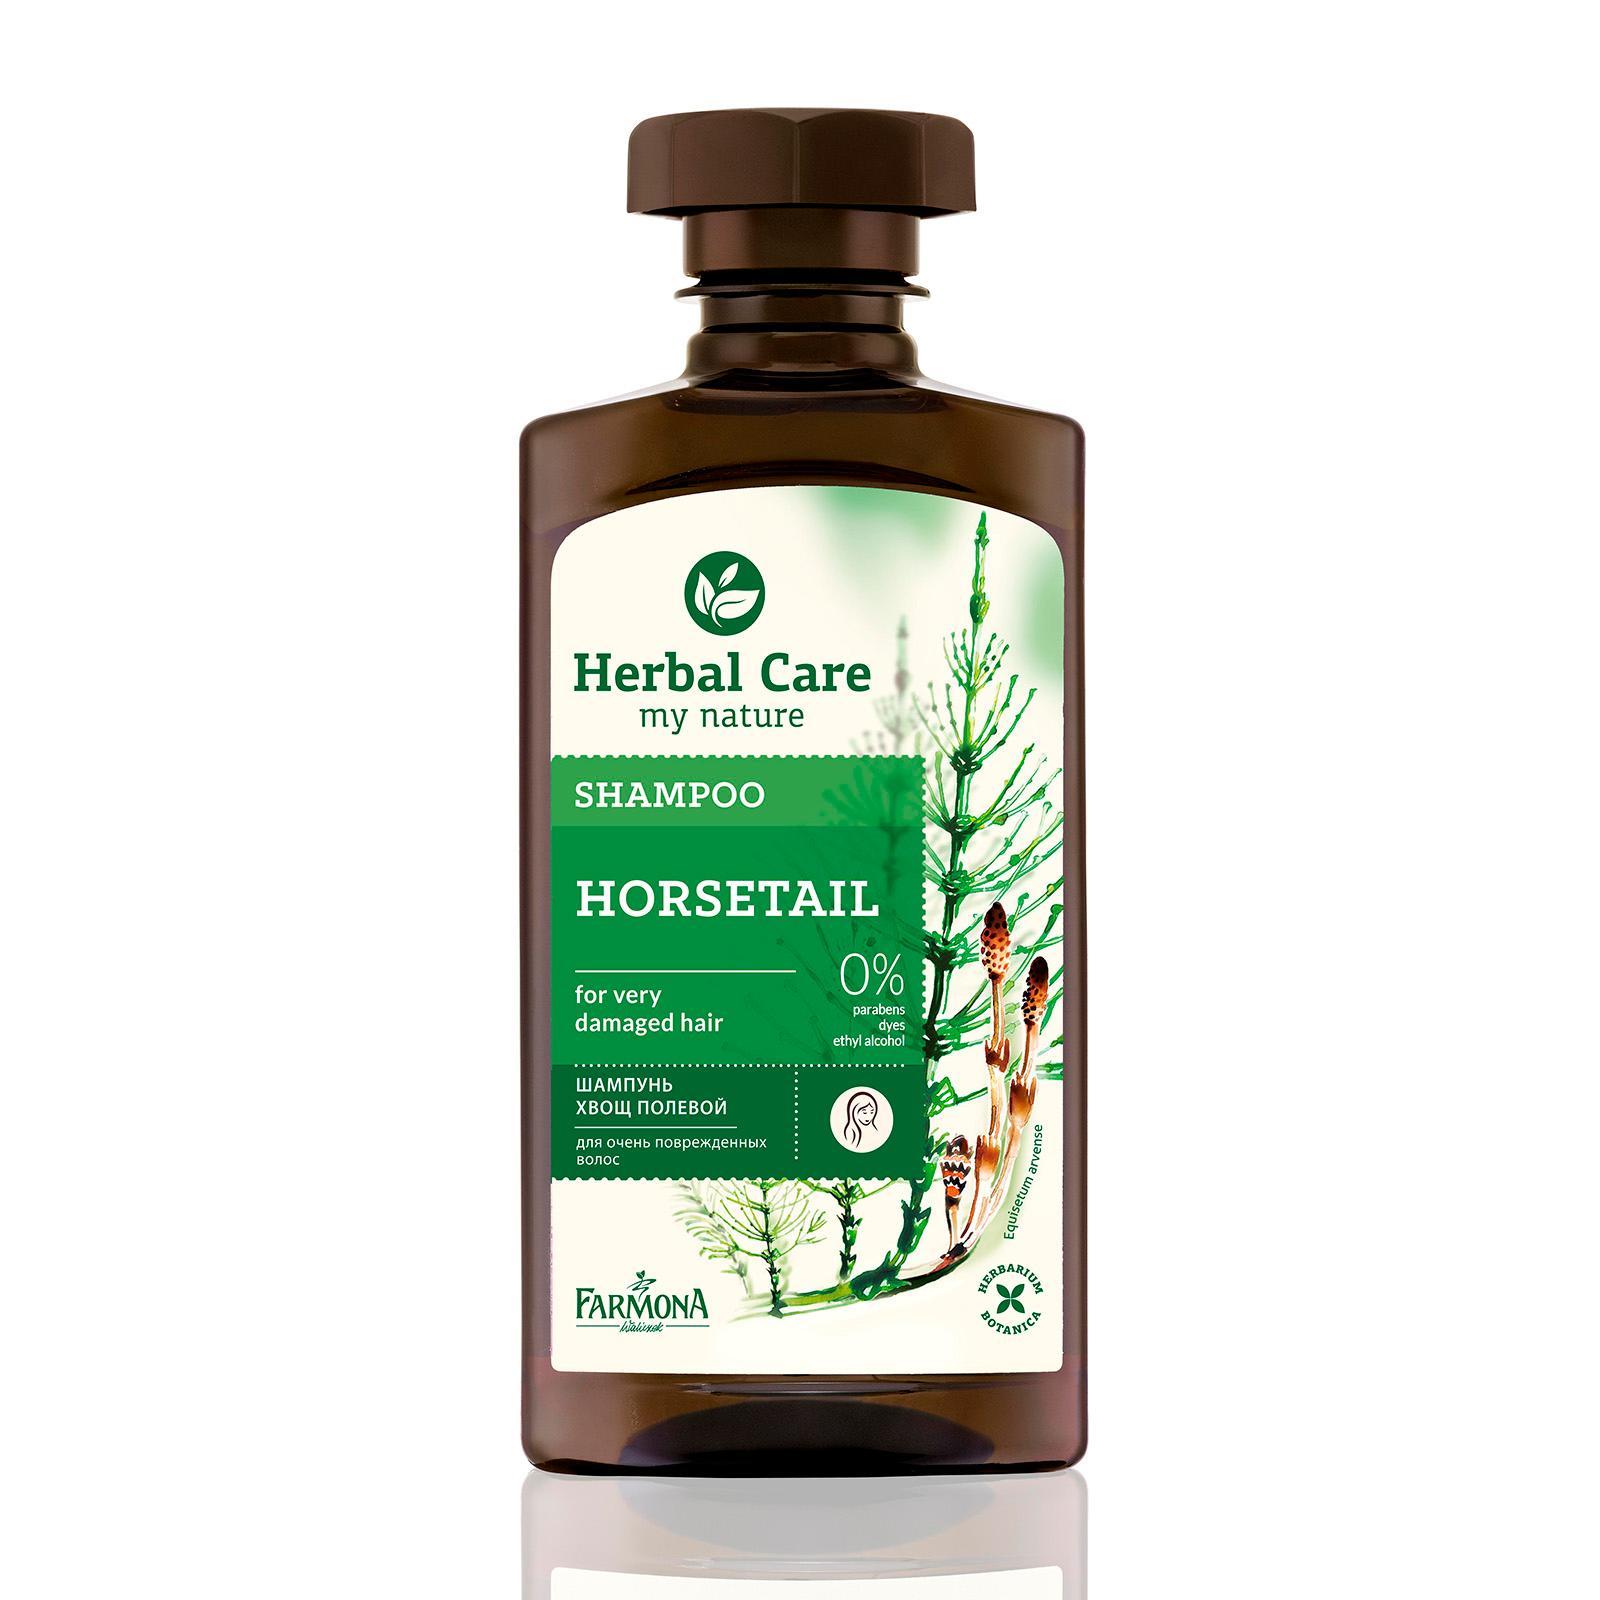 Herbal Care Horsetail Shampoo